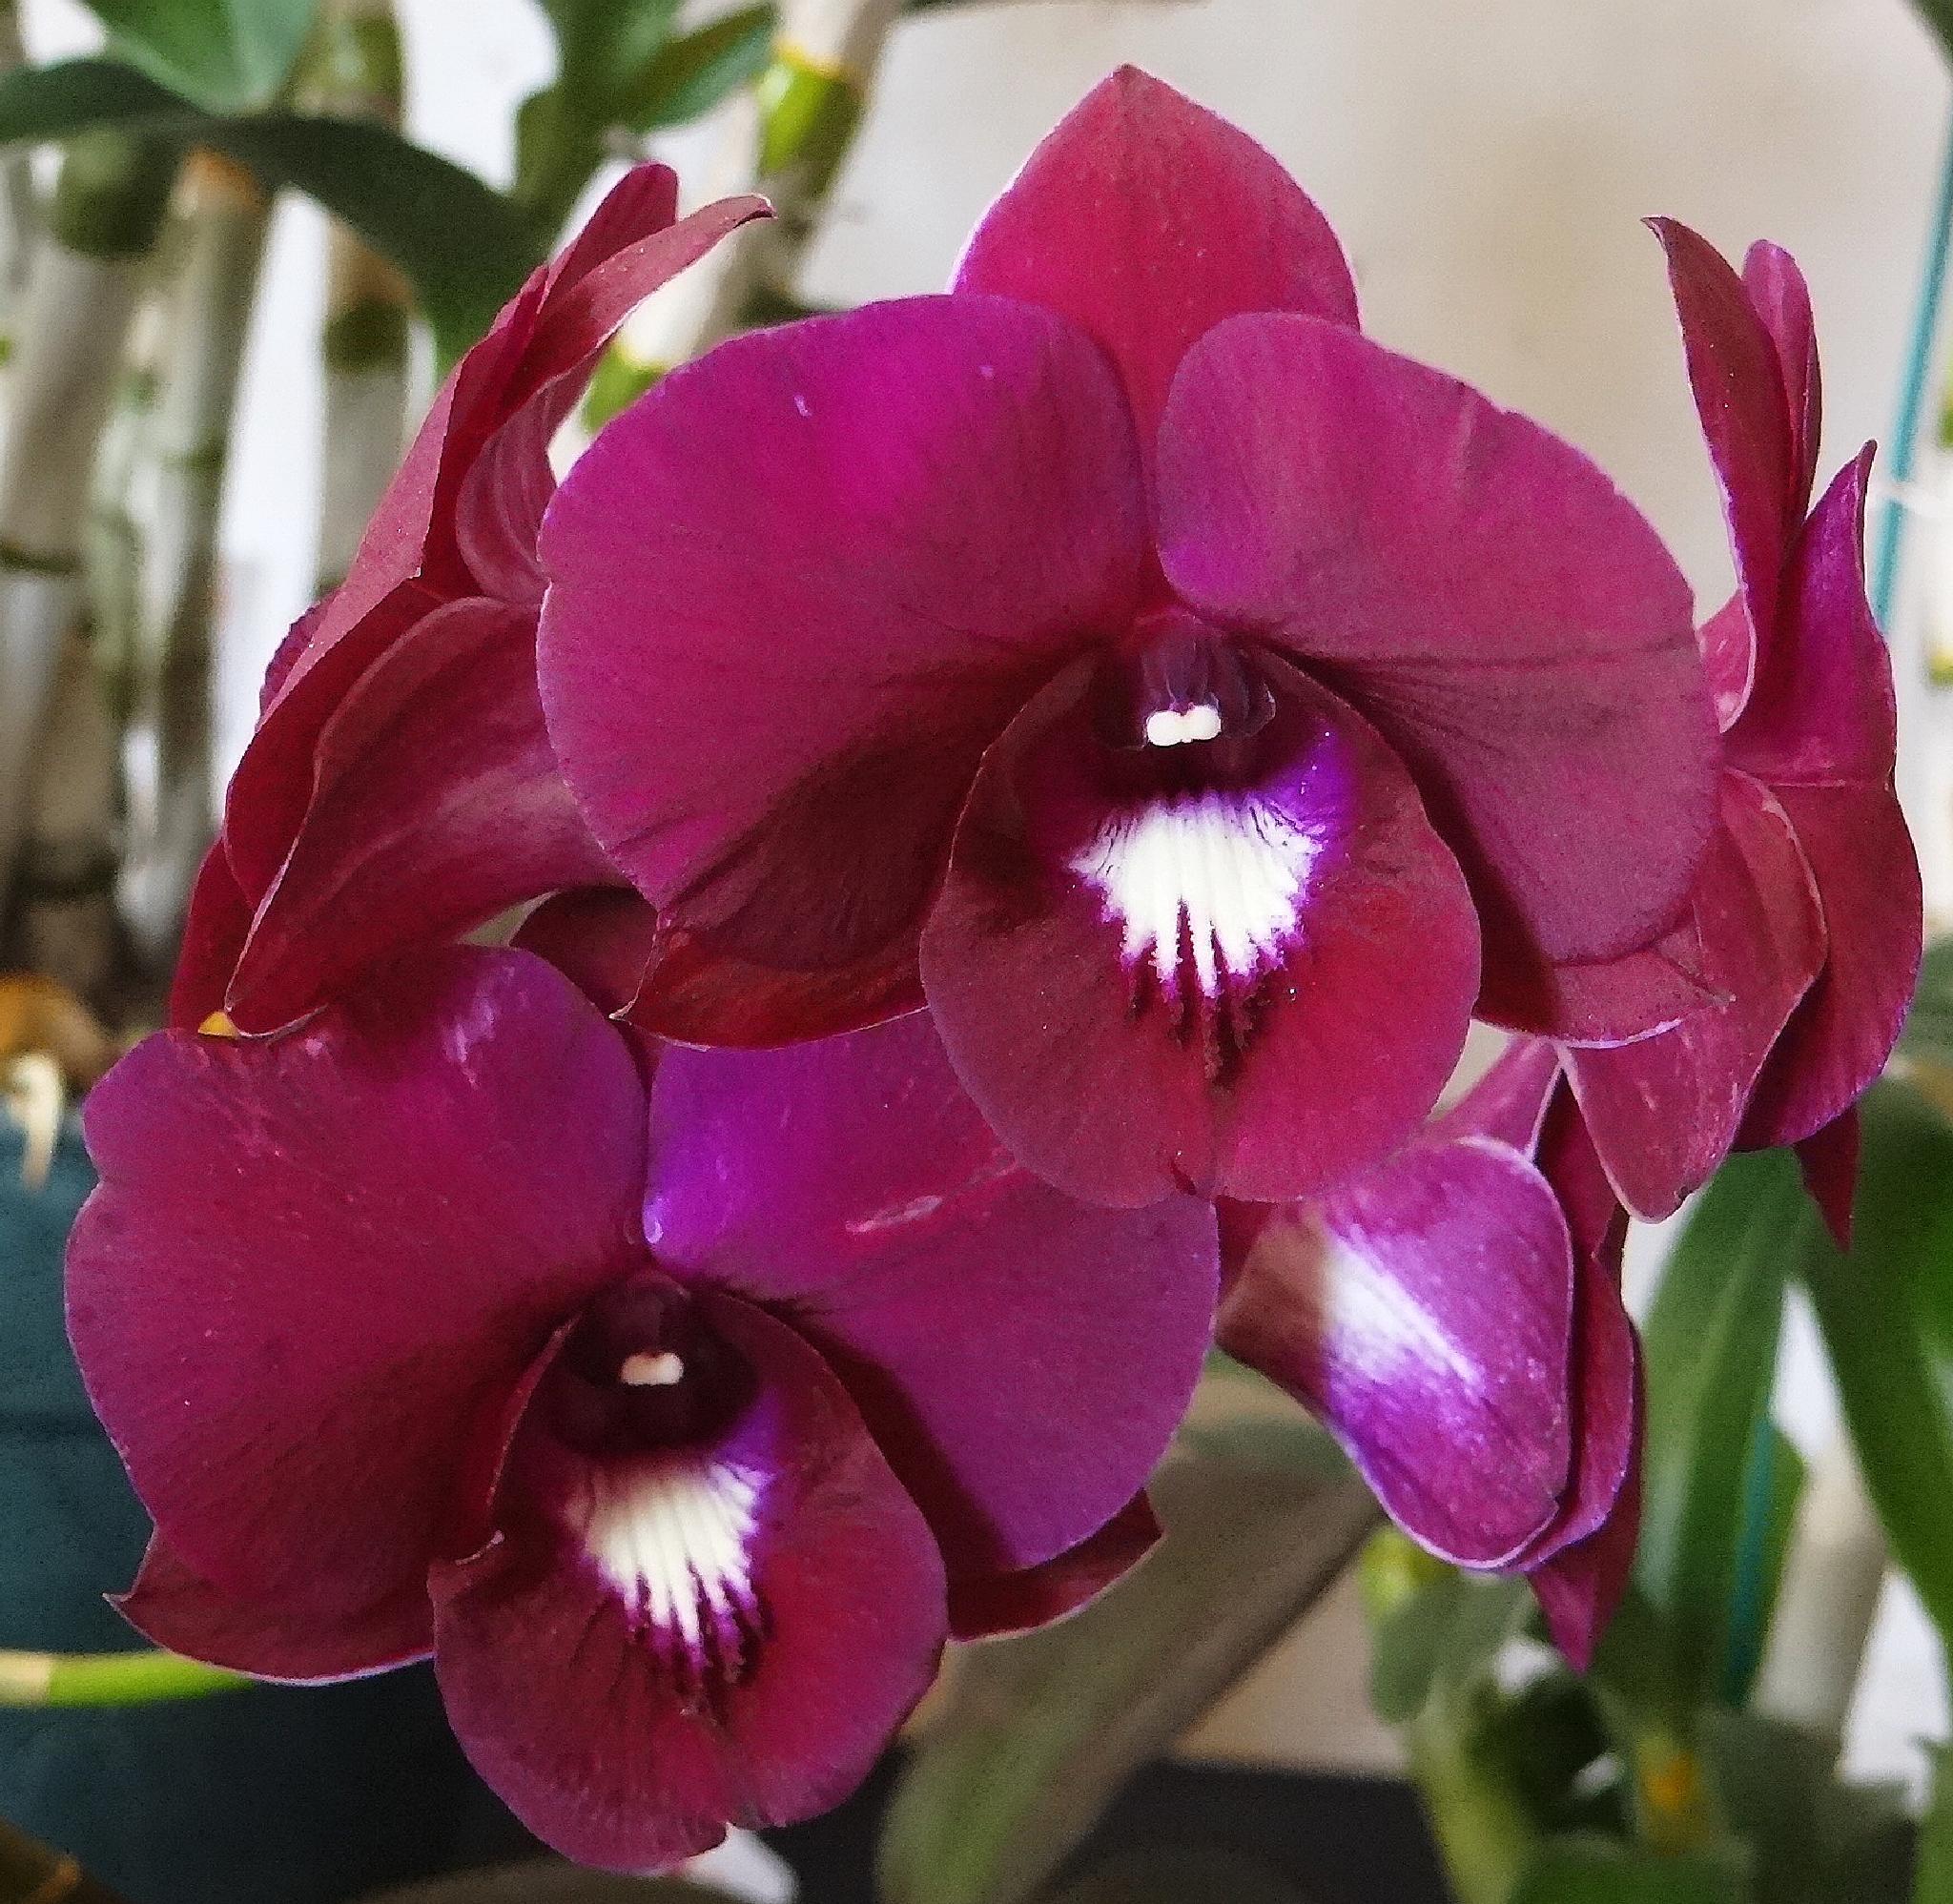 Orquídeas Corintas by vladybachez